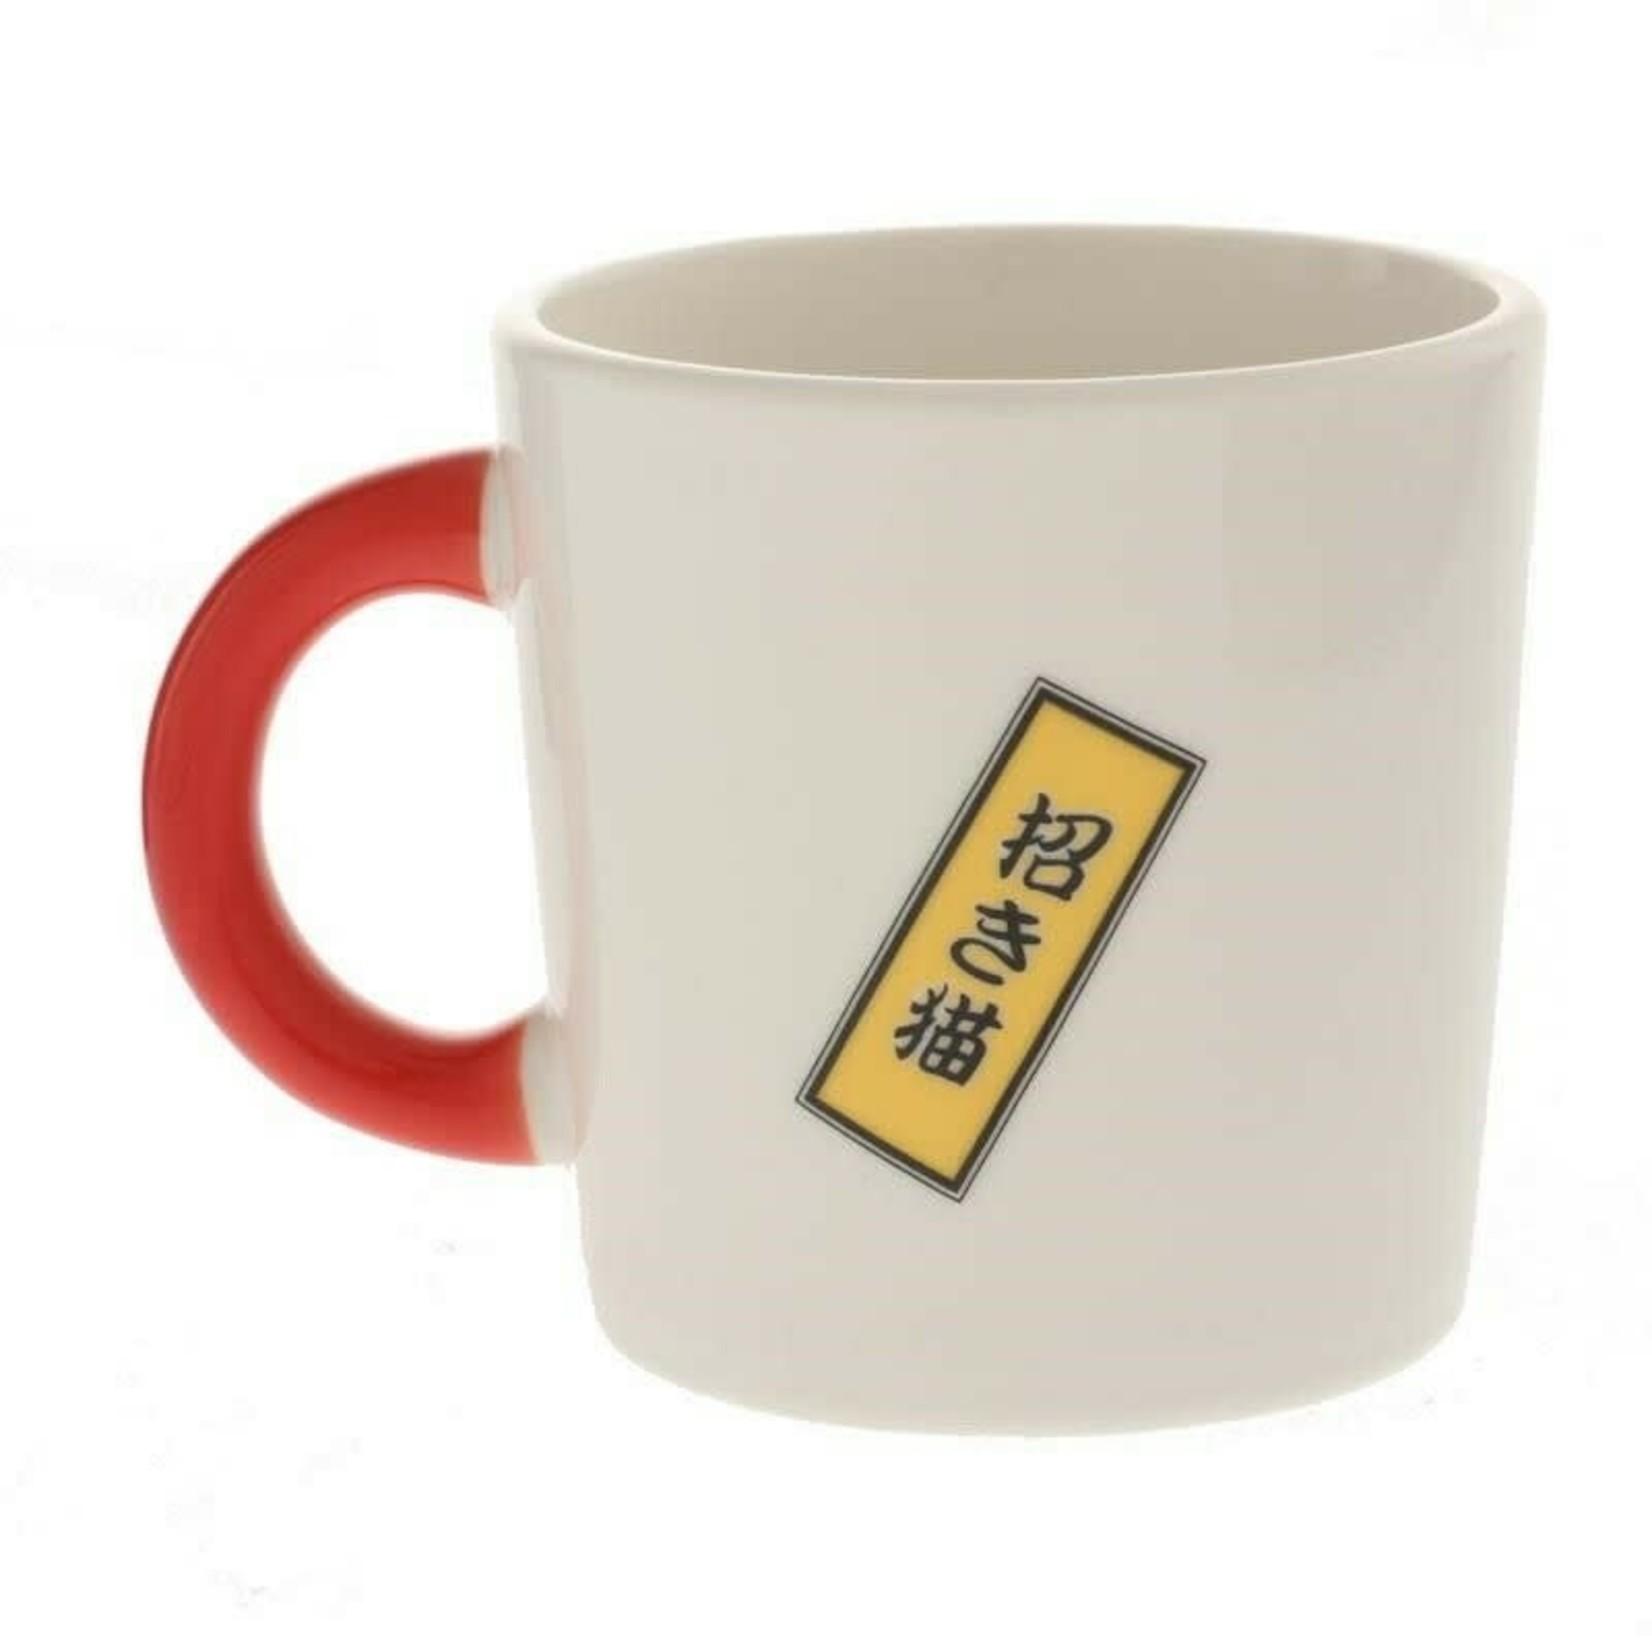 "Kotobuki Trading Co. Inc Mug ""Dento"""